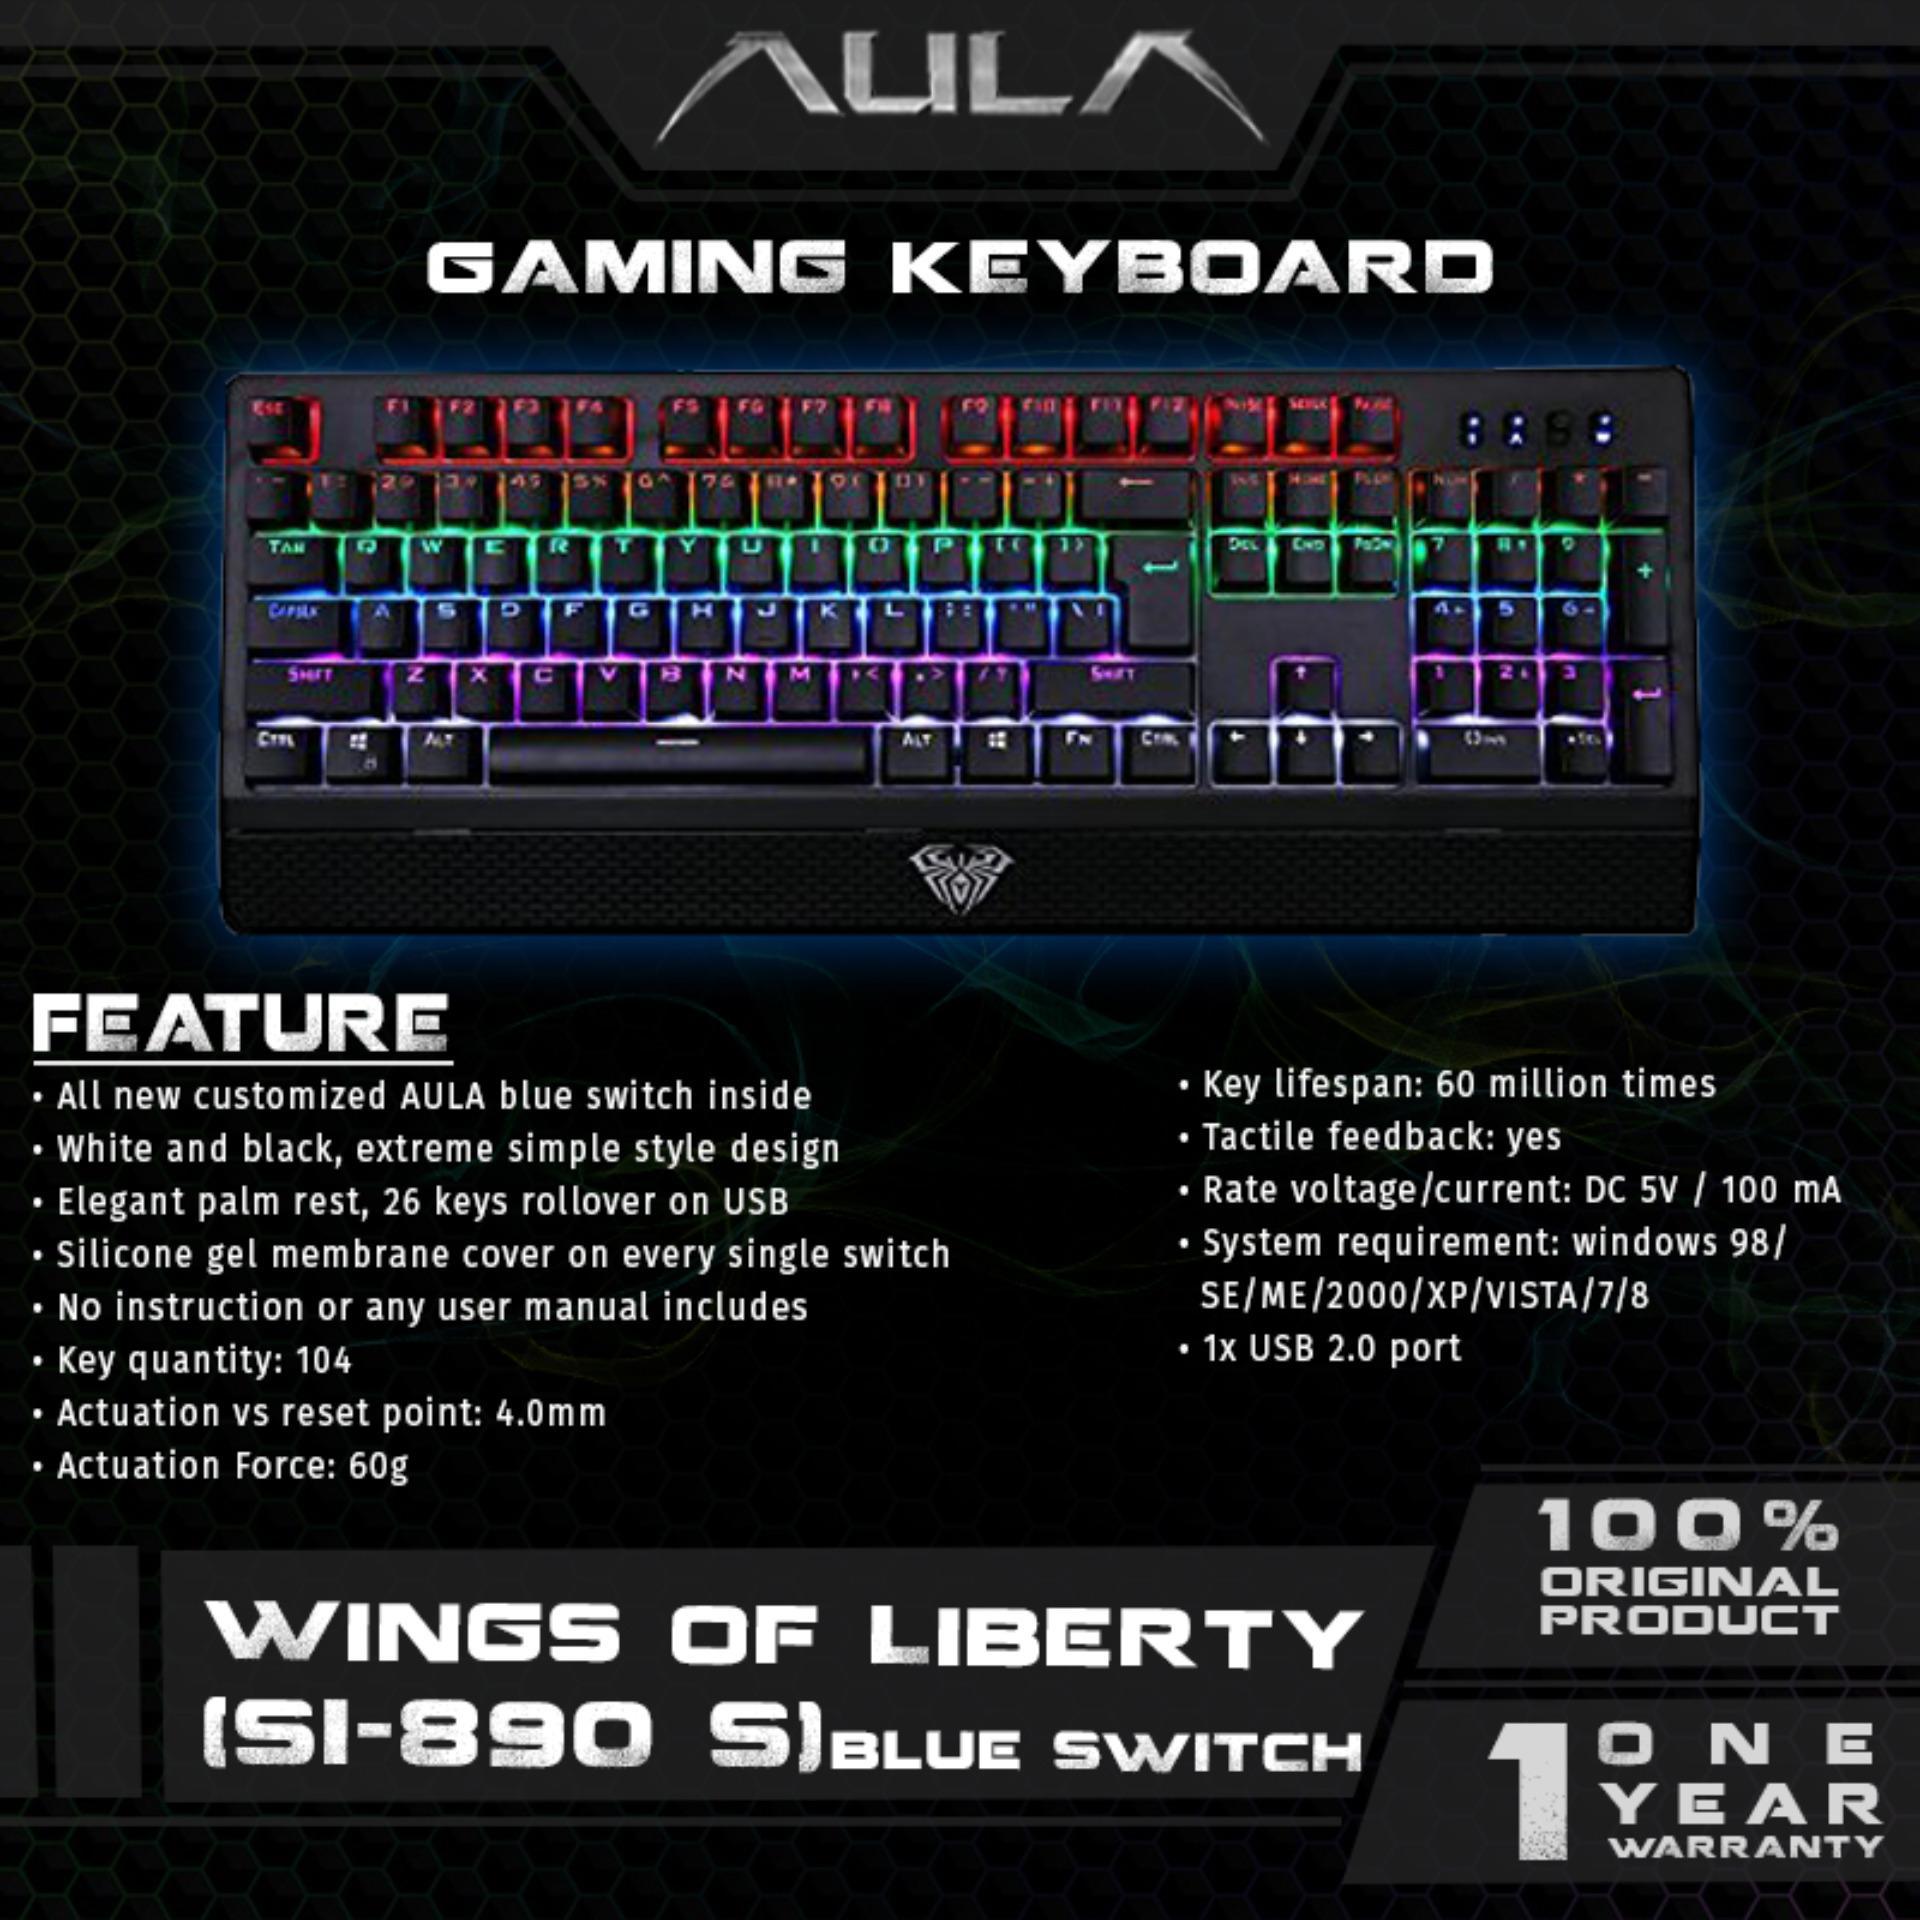 Marvo K325 Gaming Keyboard Ultra Thin Multimedia Chocolate Light Usb B3 Hitam Aula Wings Of Liberty Mechanical Blue Switch104keys Rainbow Led Backlight